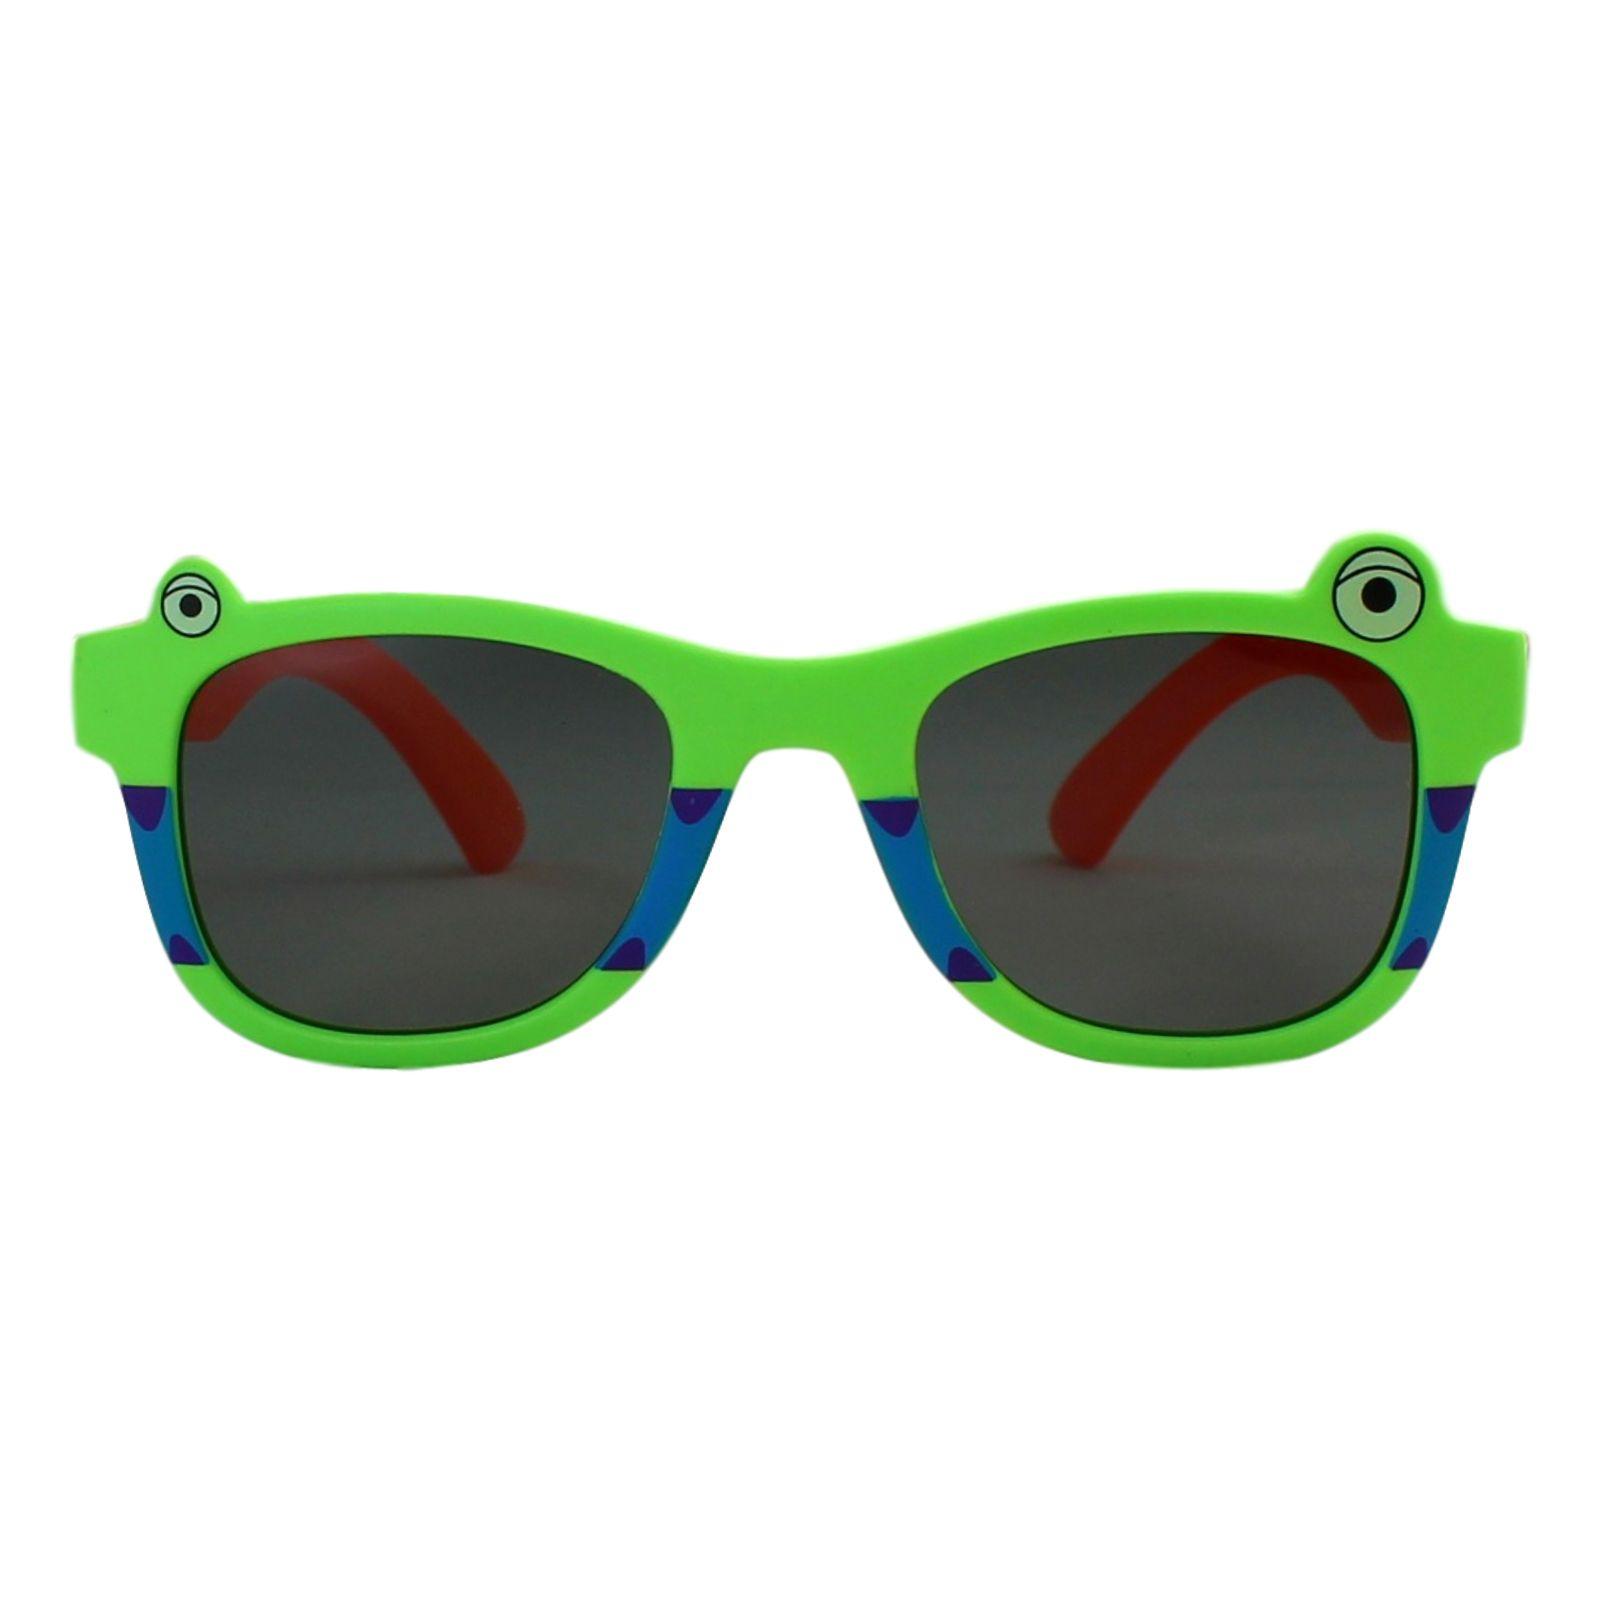 Óculos de Sol Díspar ID1958 Flexível Infantil - 6 a 9 anos - Verde